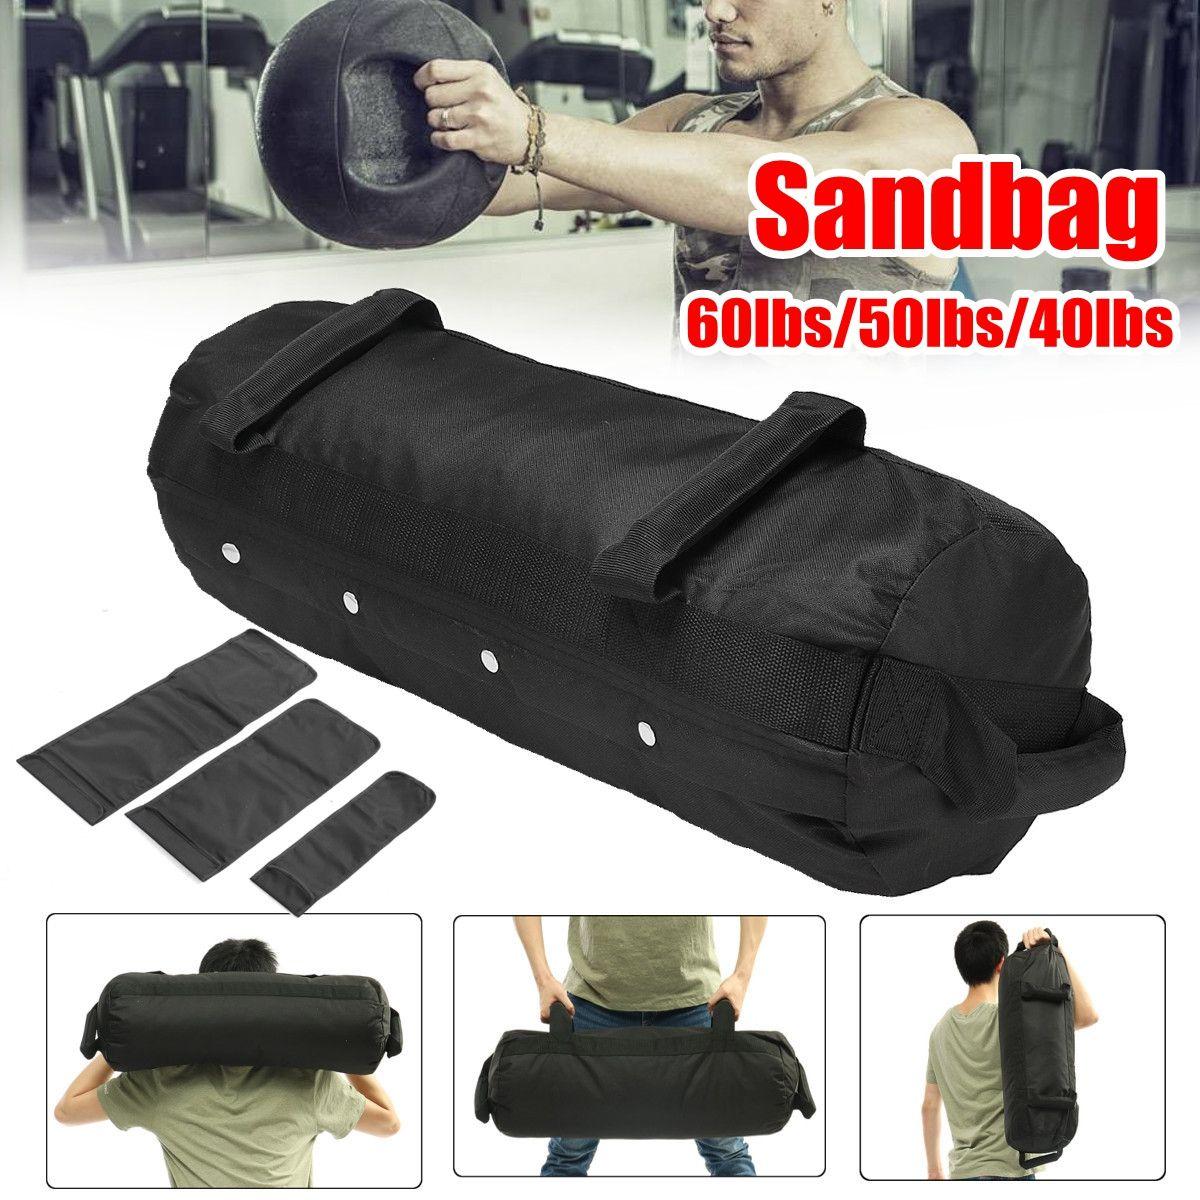 4 Pcs/Set Weightlifting Sandbag Heavy DutySand Bags Sand Bag MMA Boxing Crossfit Military Power Training Body Fitness Equipment